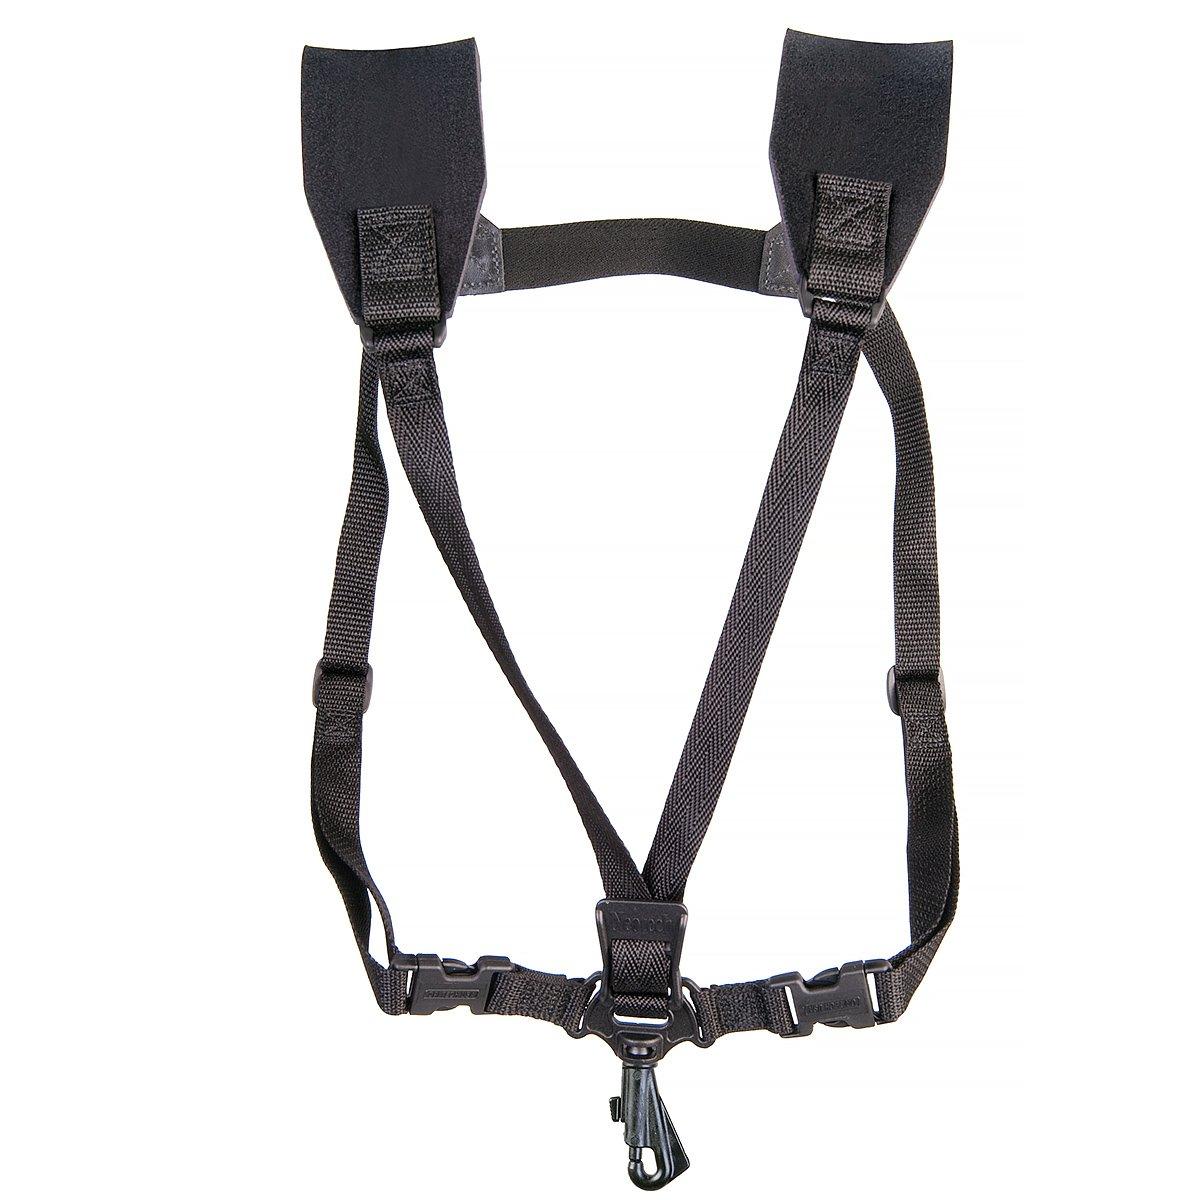 Neotech 2501162 Soft Harness - Adjustable Saxophone Harness, Regular, Swivel Hook